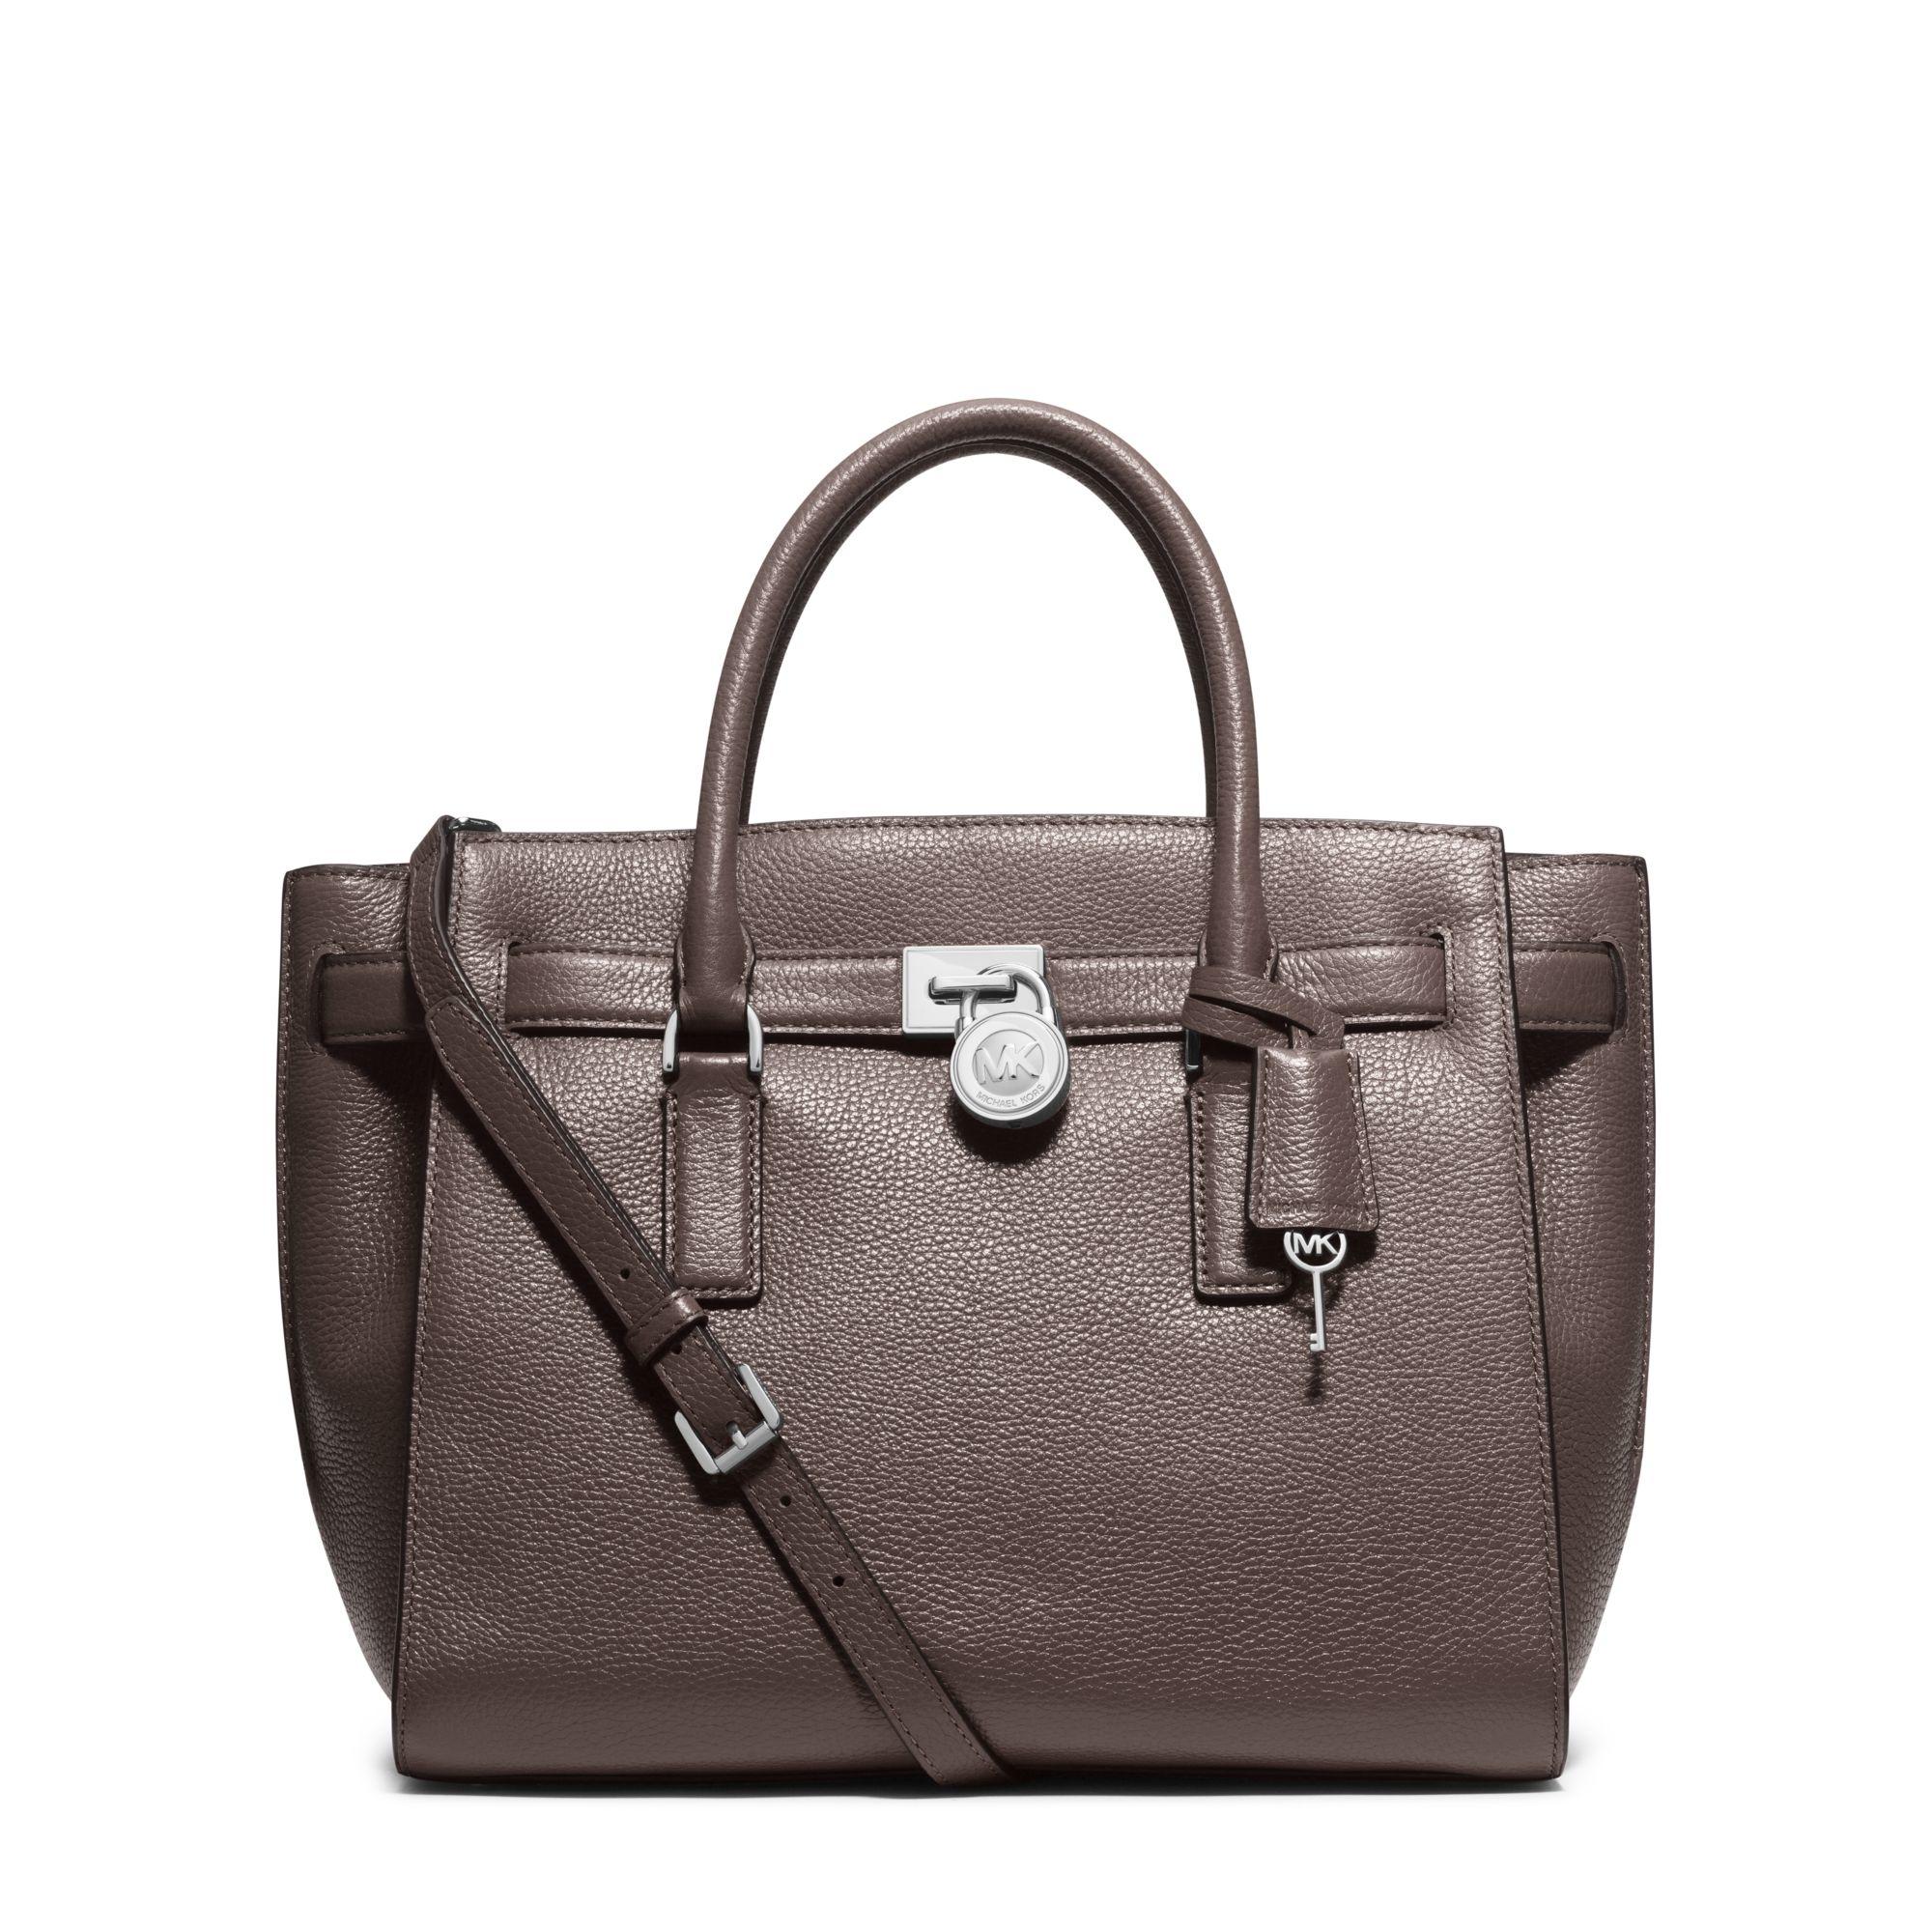 lyst michael kors hamilton traveler large leather satchel in gray rh lyst com